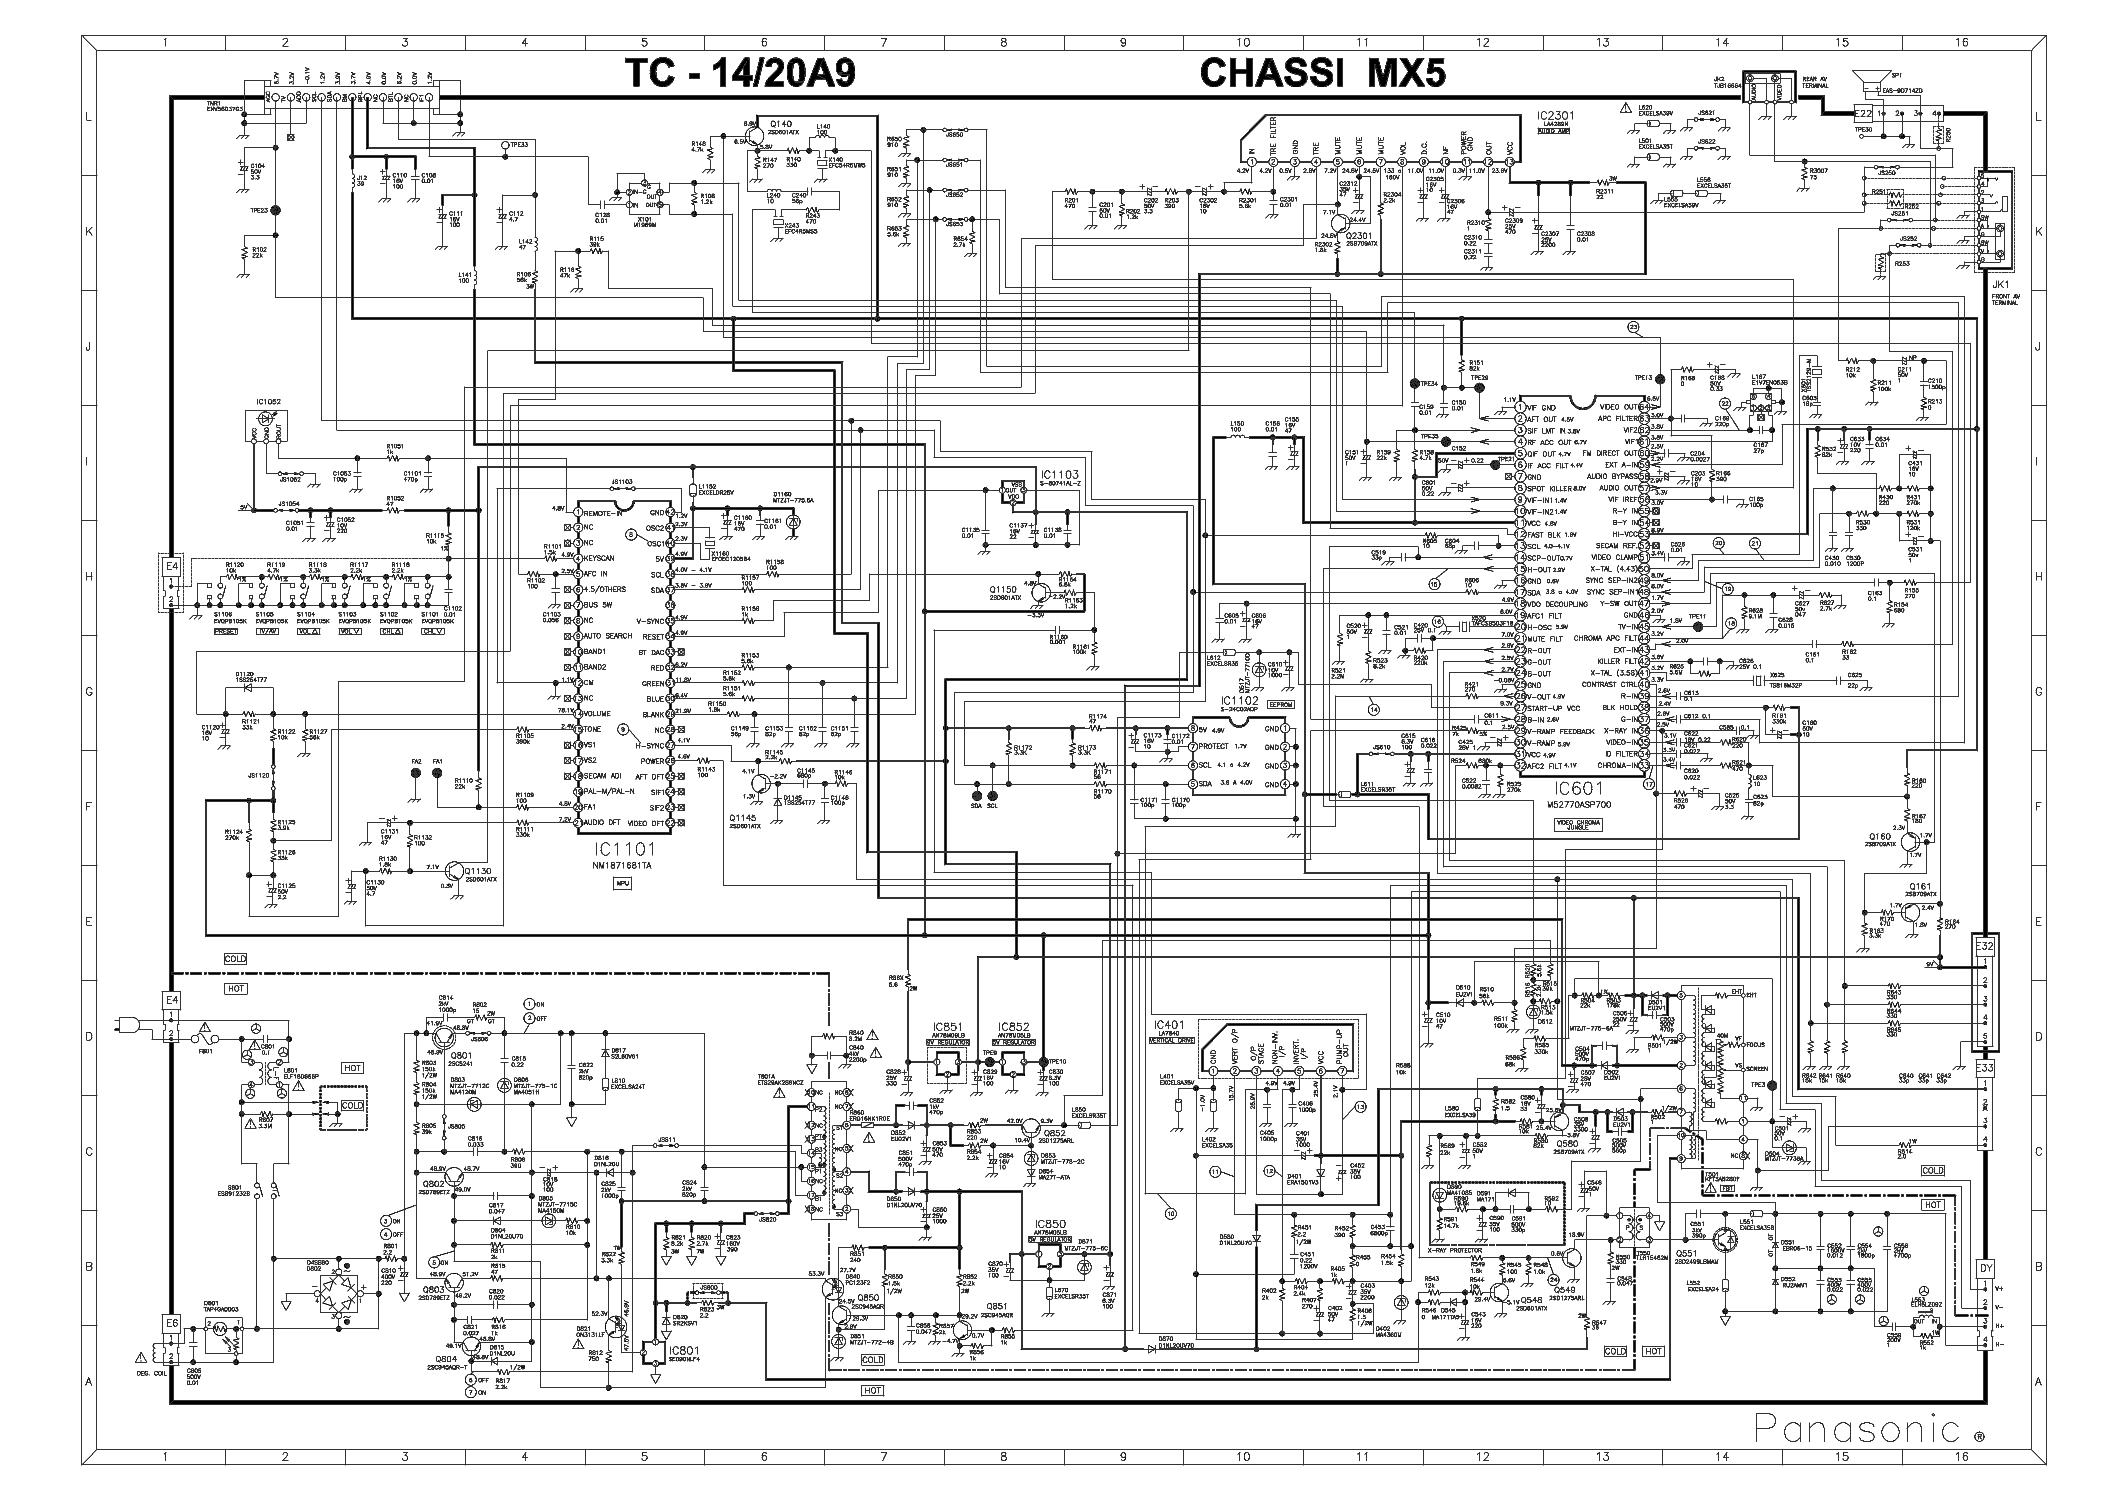 Panasonic Viera Manual Tbm2ax